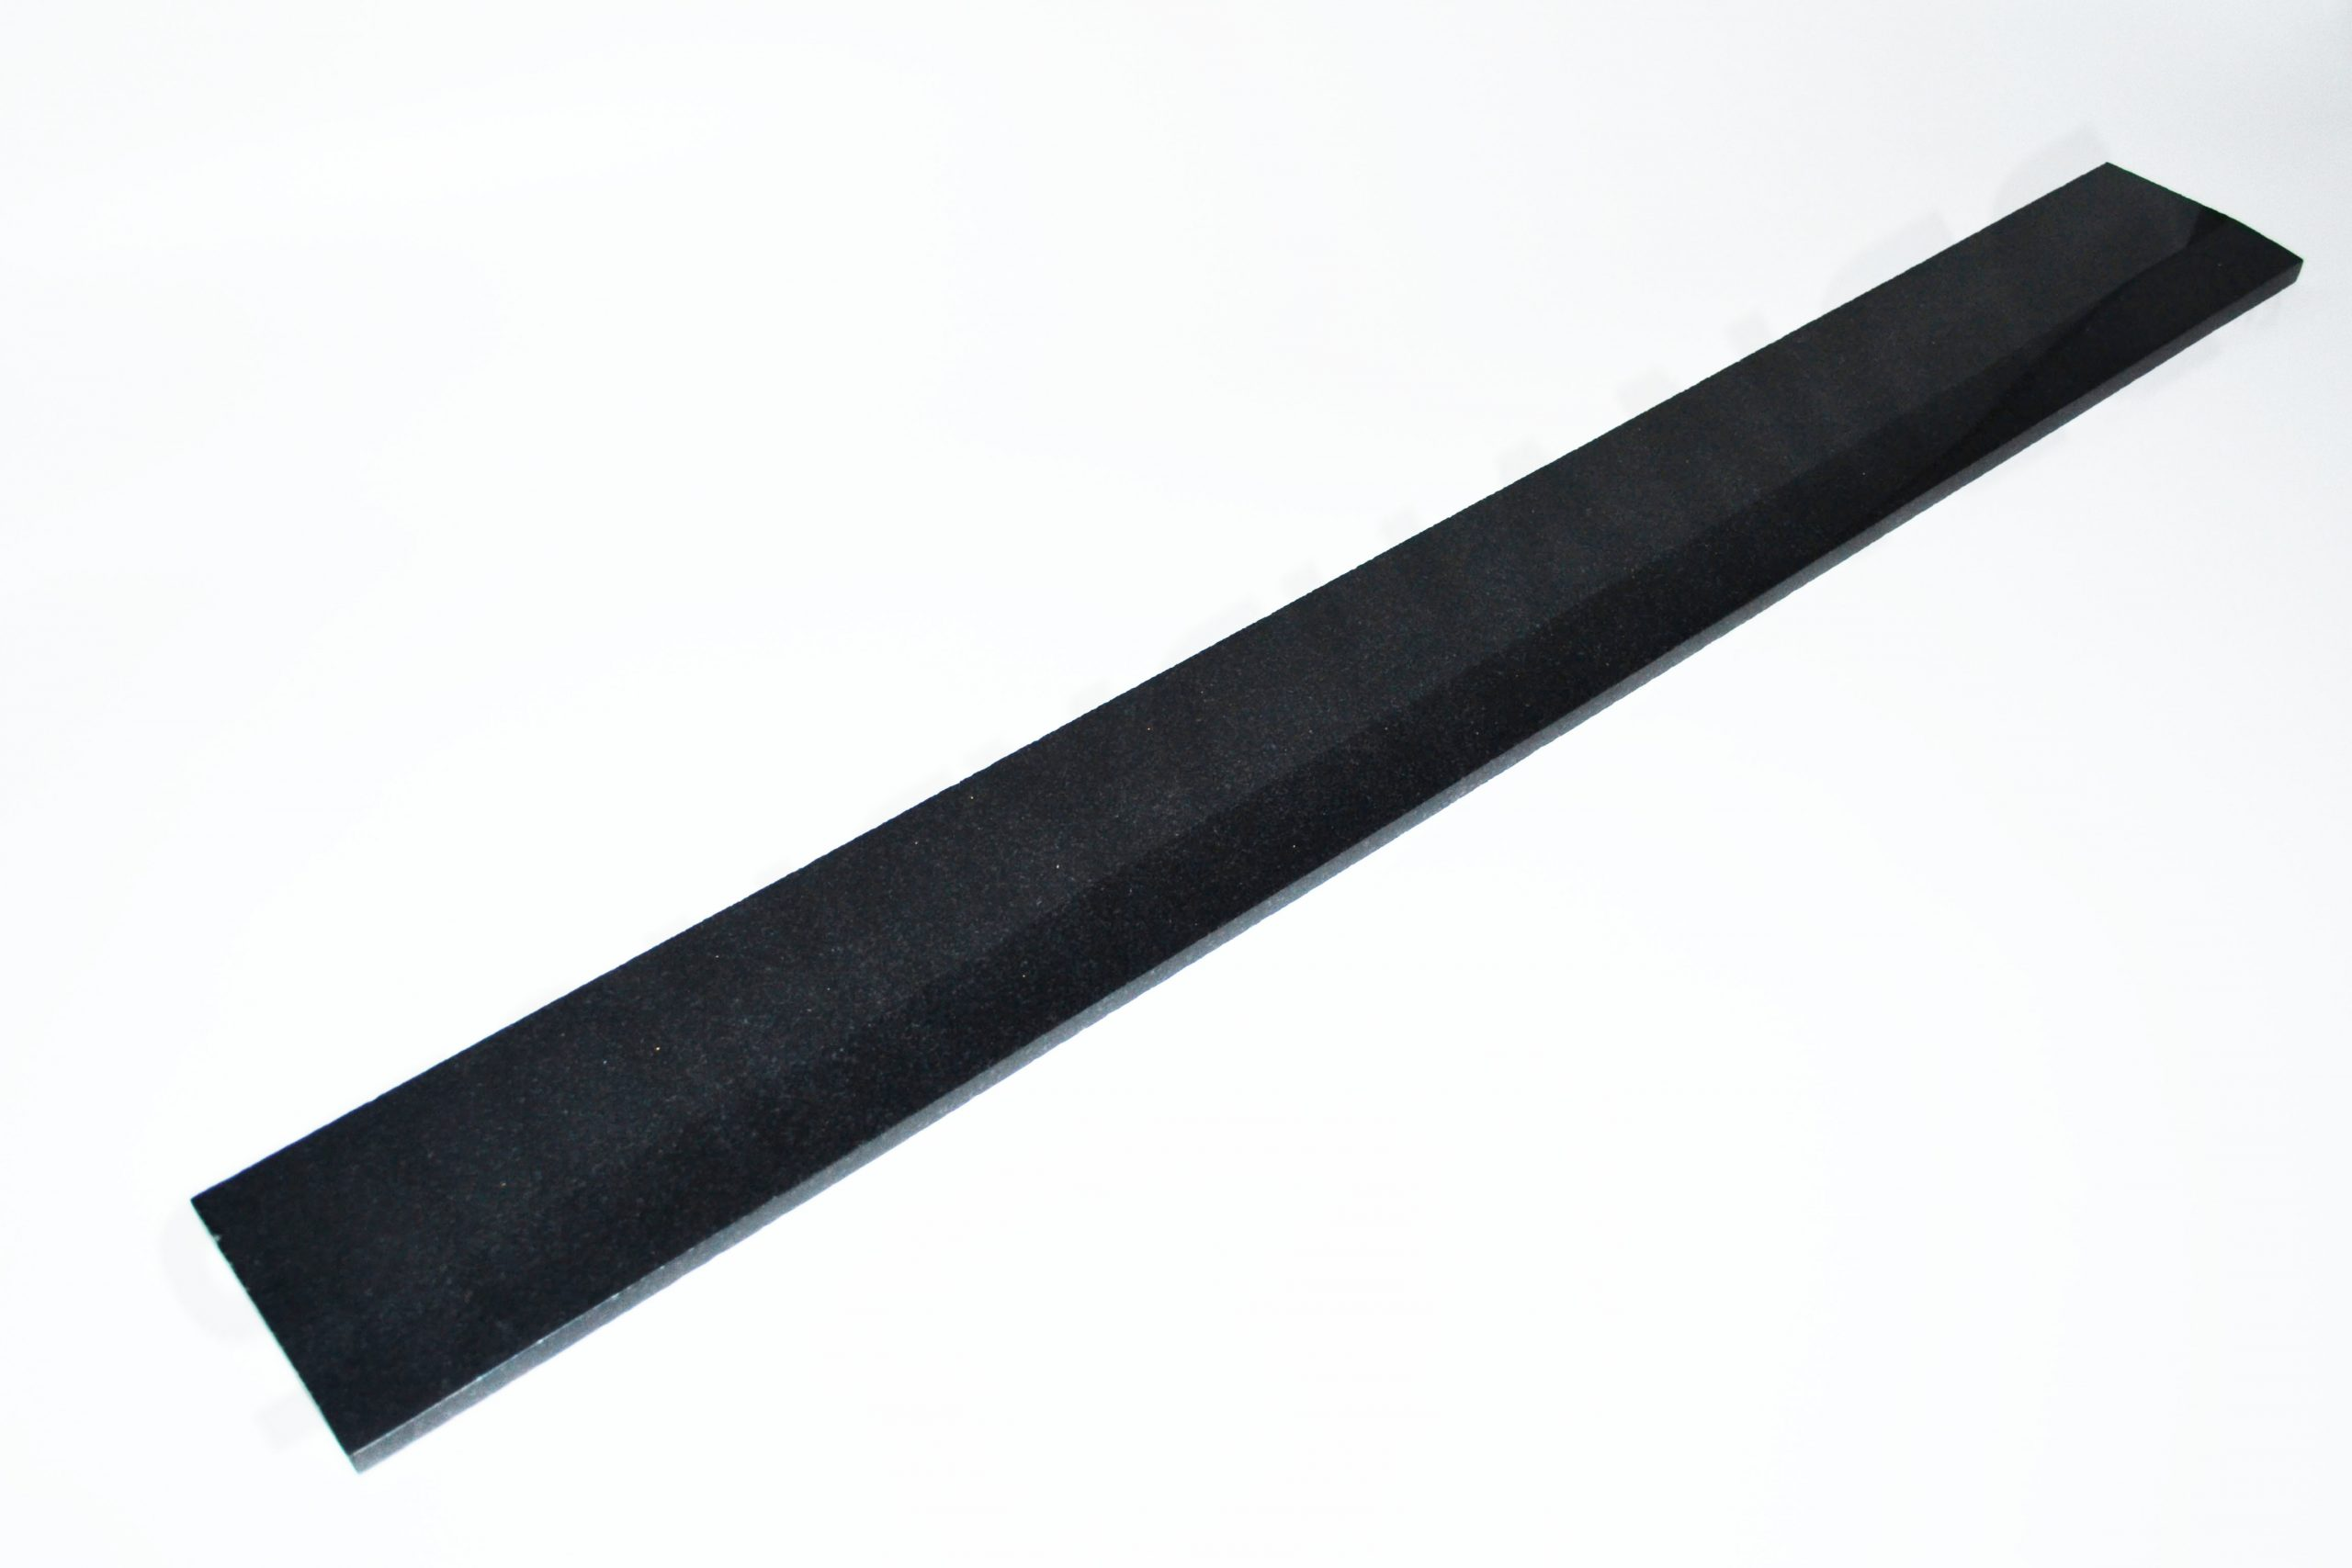 Absolute Black Granite Single Hollywood Threshold 4x36